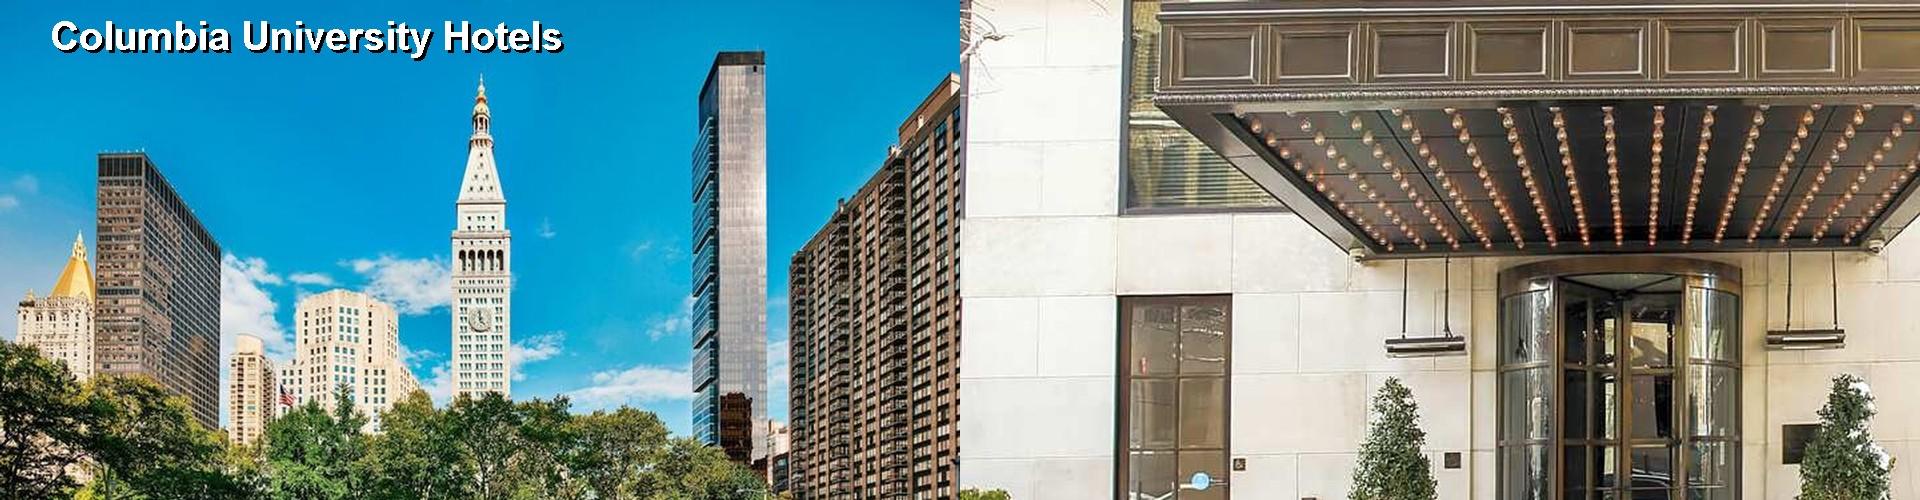 5 Best Hotels Near Columbia University